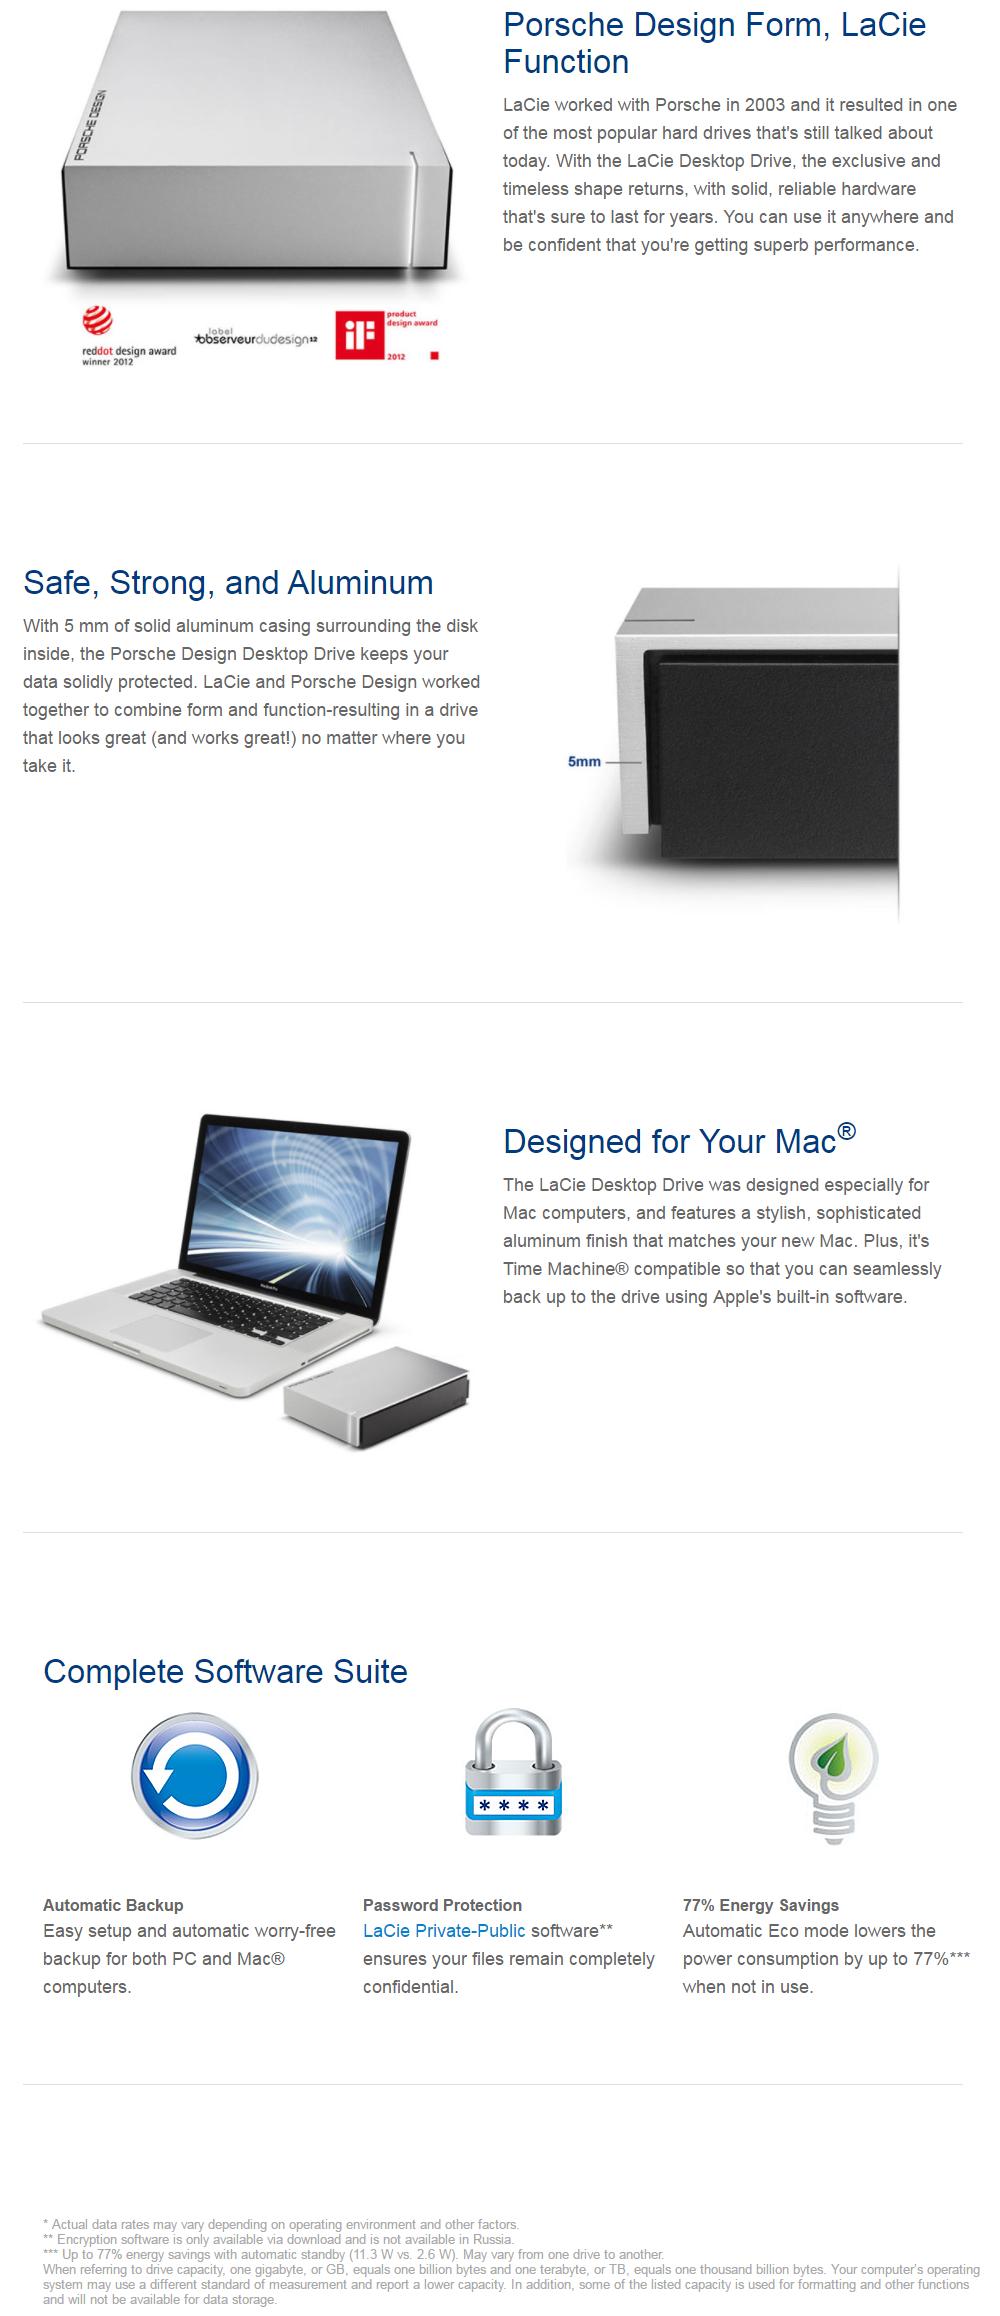 lacie porsche design 4tb usb3 0 desktop drive stew4000400. Black Bedroom Furniture Sets. Home Design Ideas